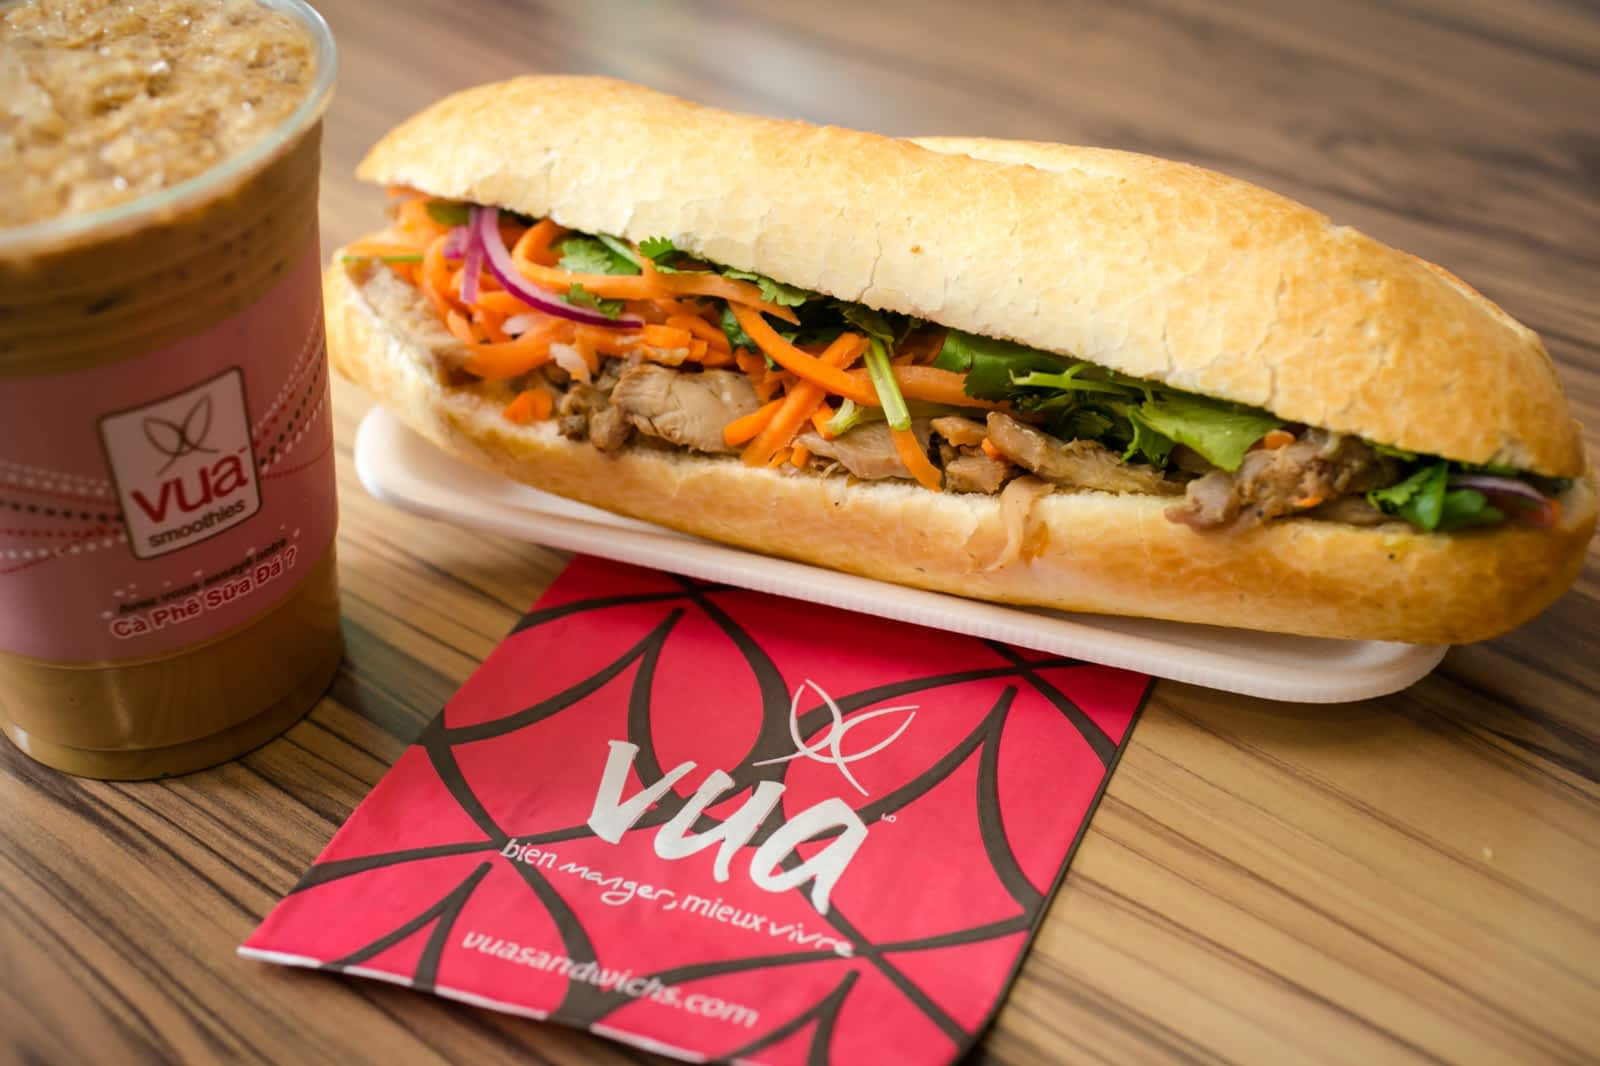 VUA Sandwich et Sushi